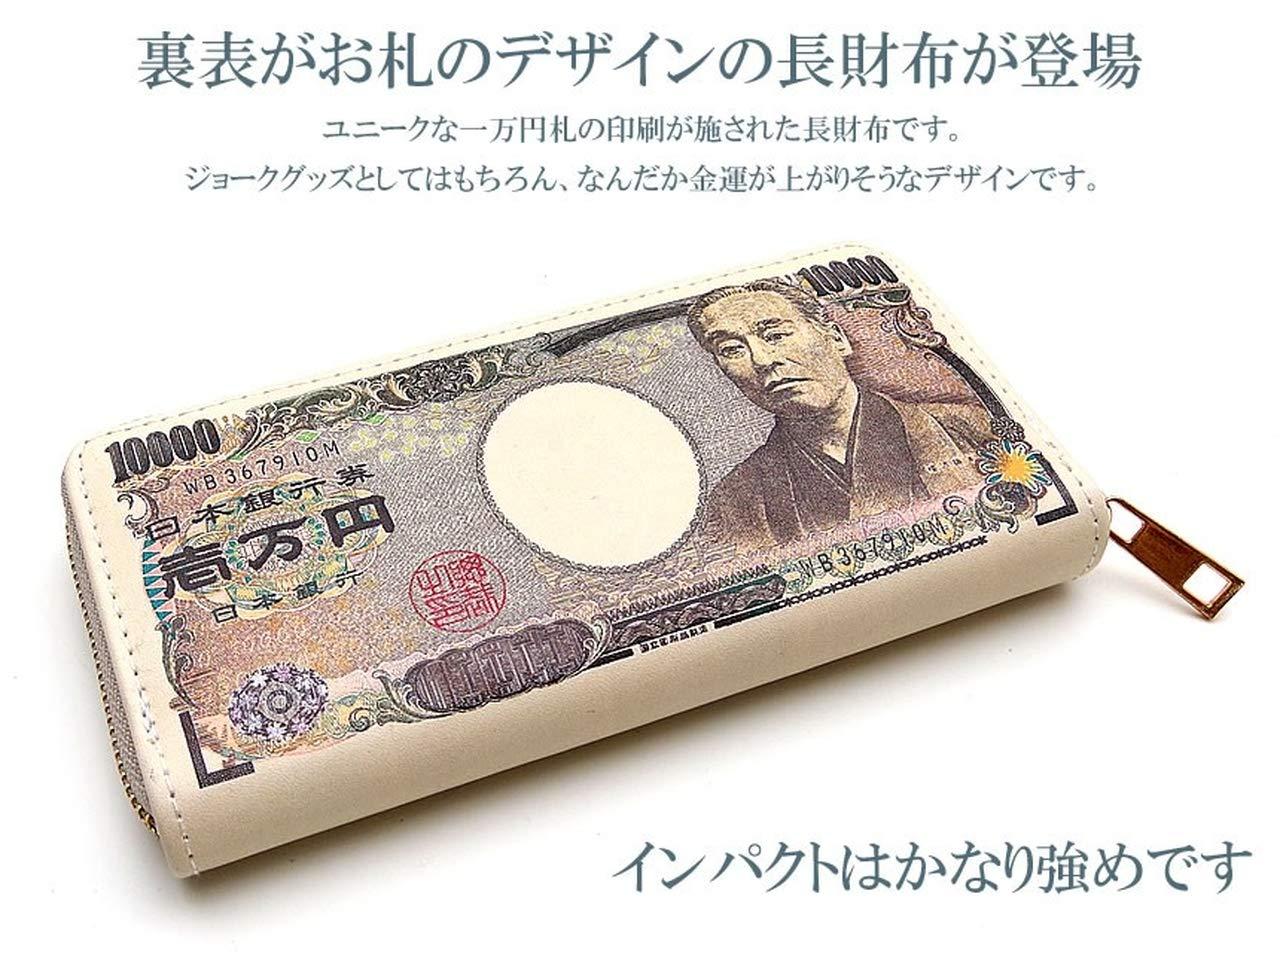 85655cef58ee Amazon.co.jp: GoodsLand 【人目を惹きつける】 諭吉 財布 おもしろ 面白 長財布 ネタ ジョーク グッズ 宴会 パーティー  GD-YUKINAGA: おもちゃ